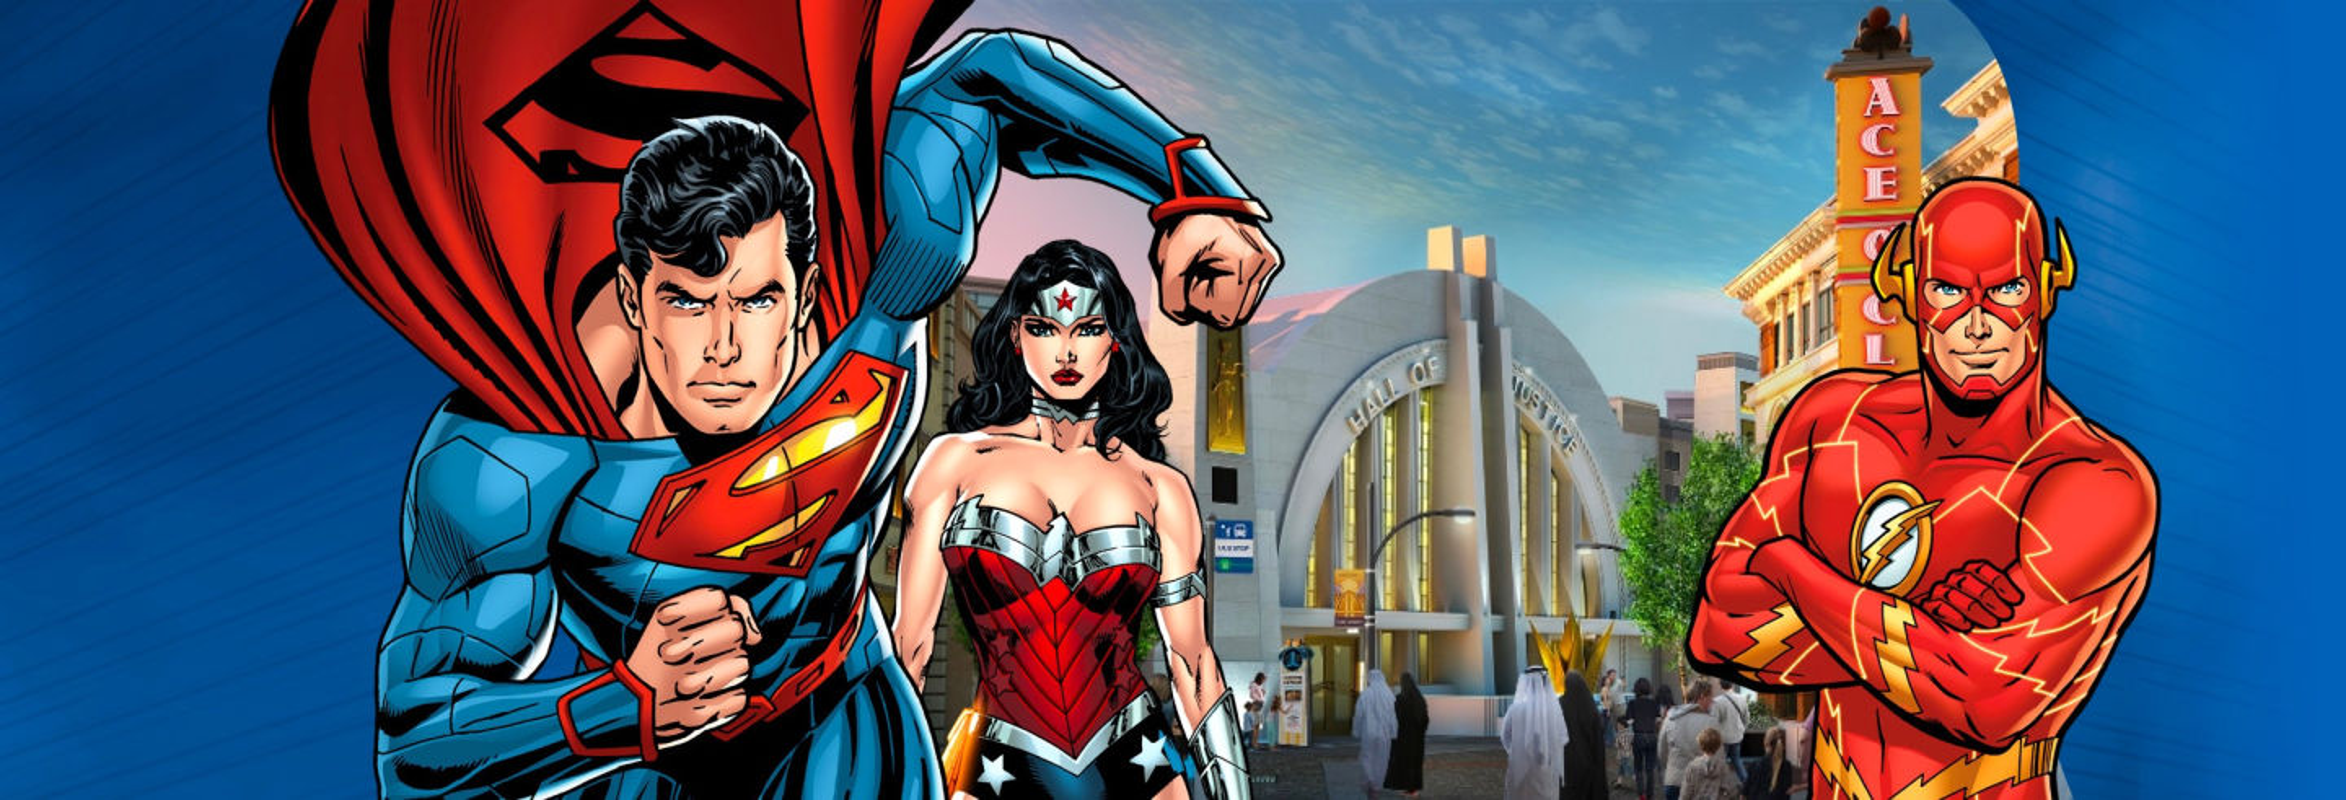 Warner Bros World Day Trip